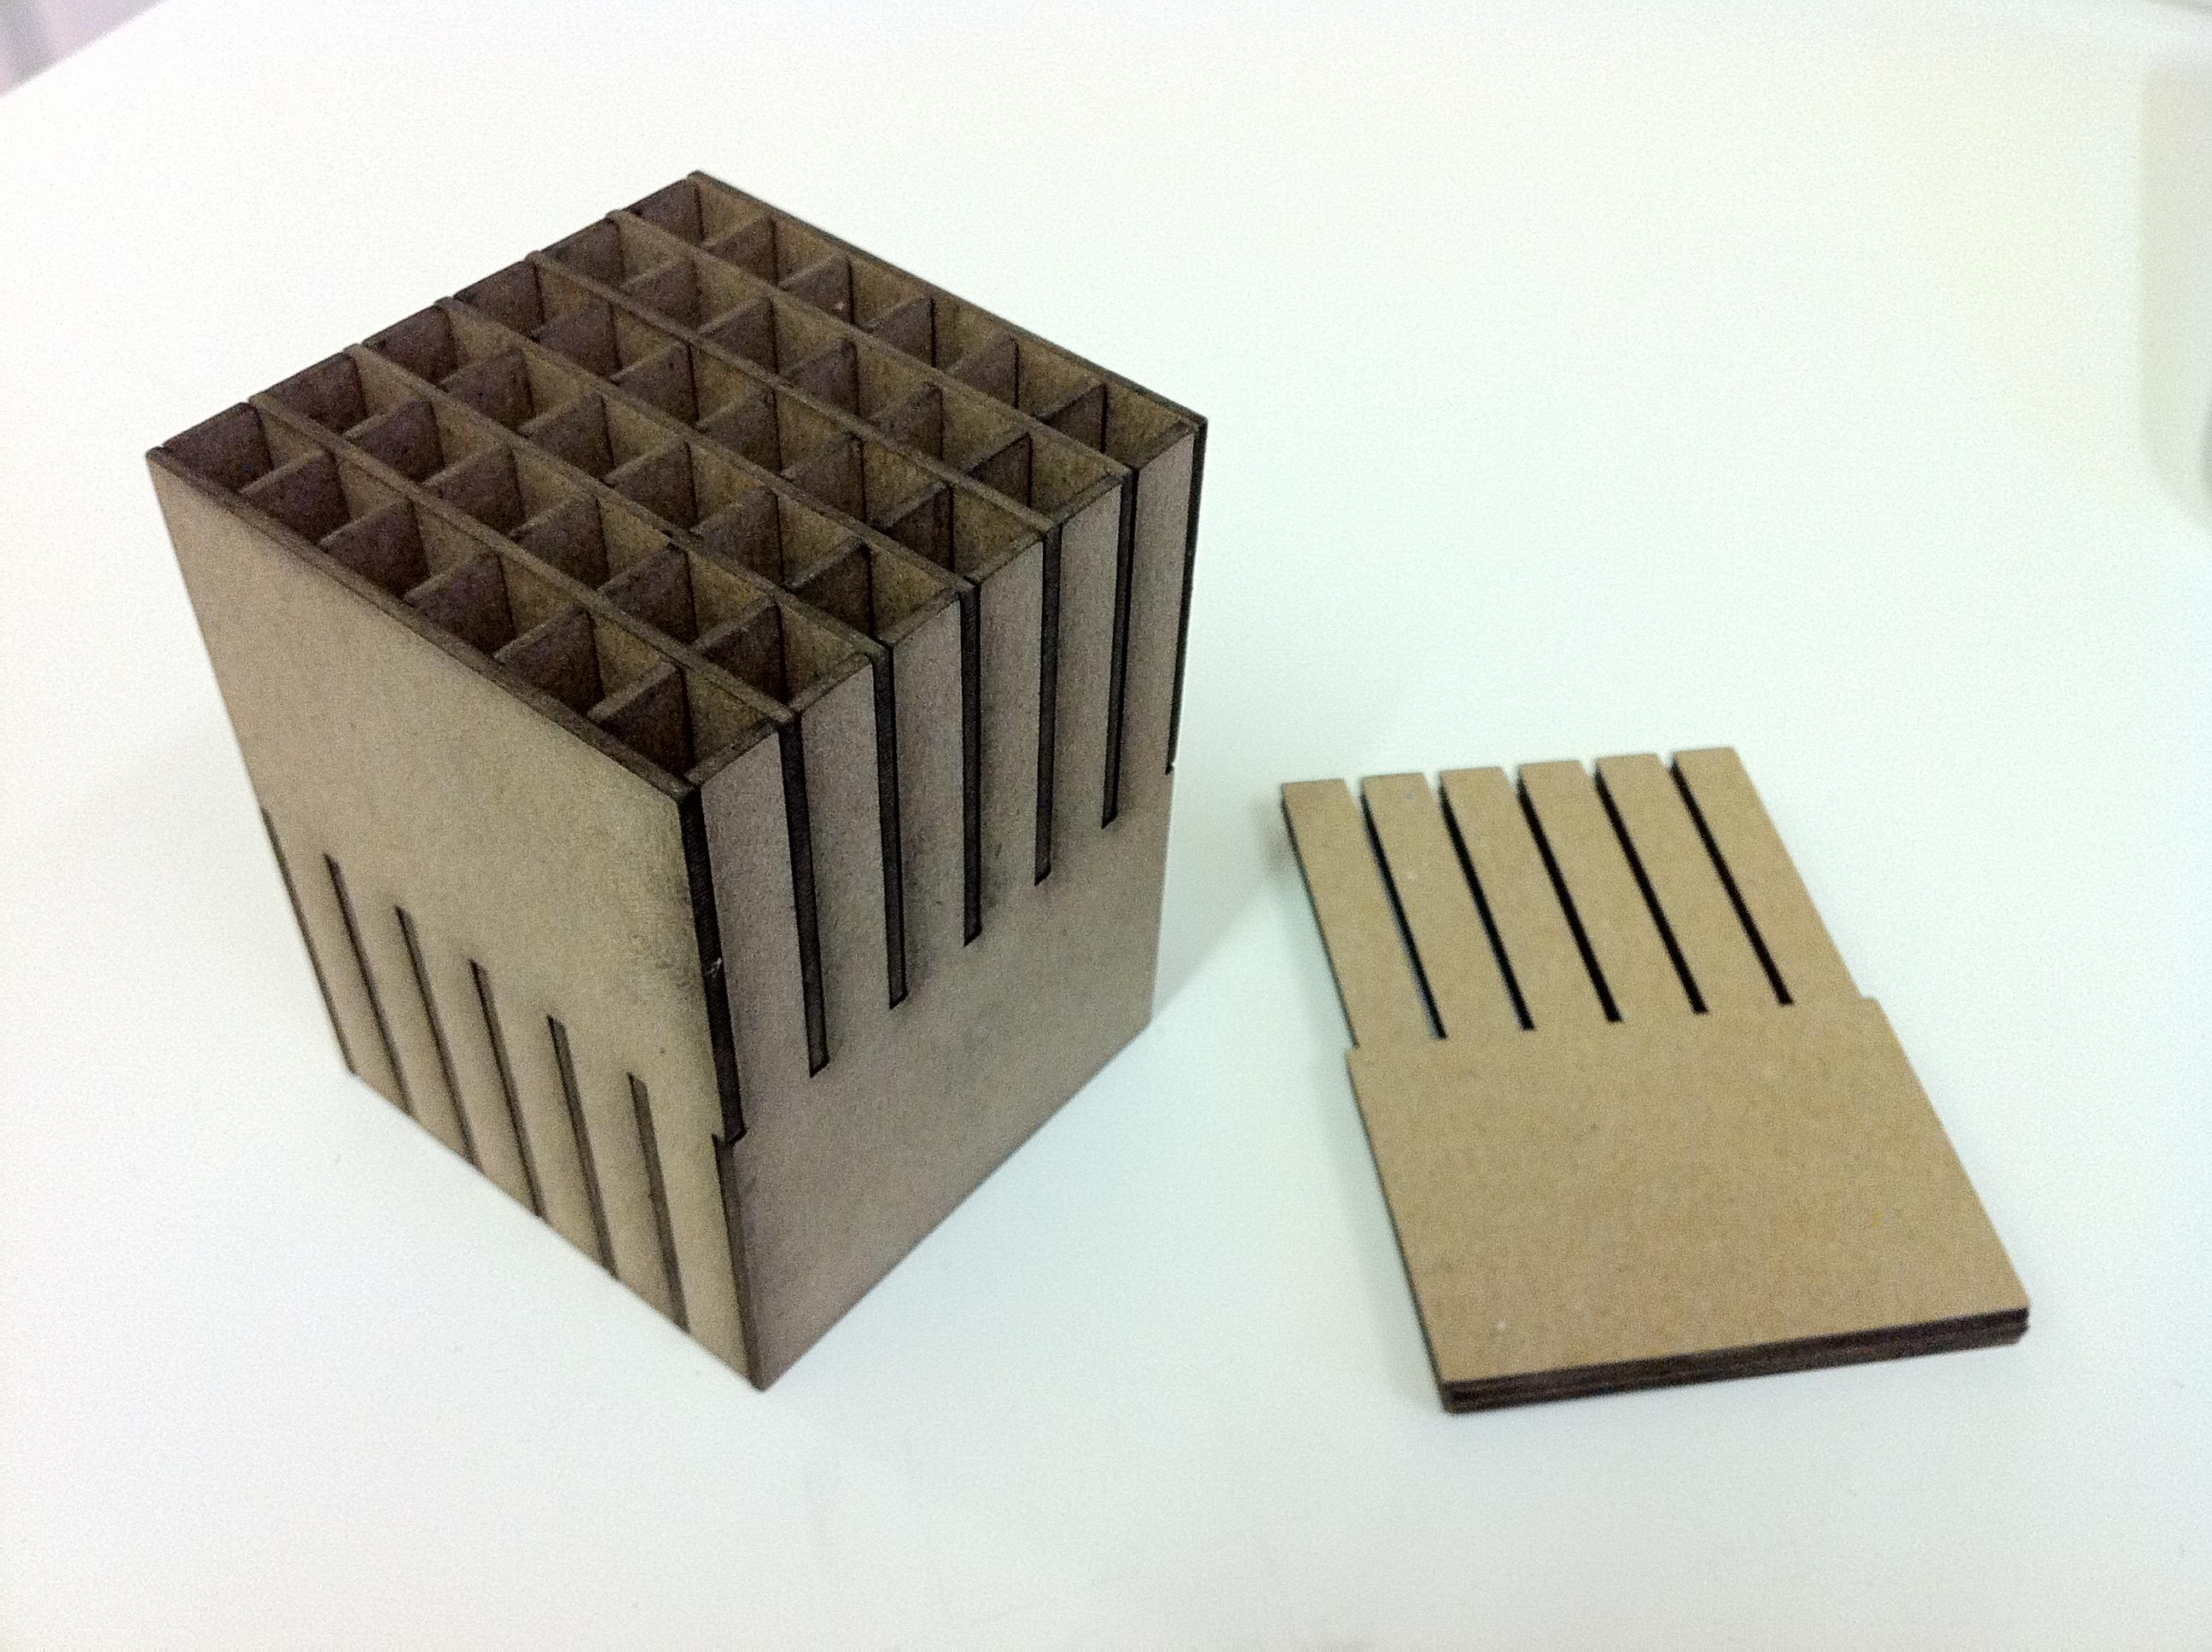 Laser-CutZ | NYC Cardboard / Greyboard Laser Cutting and 3D CAD Design for Laser Cut Cardboard Box  61obs